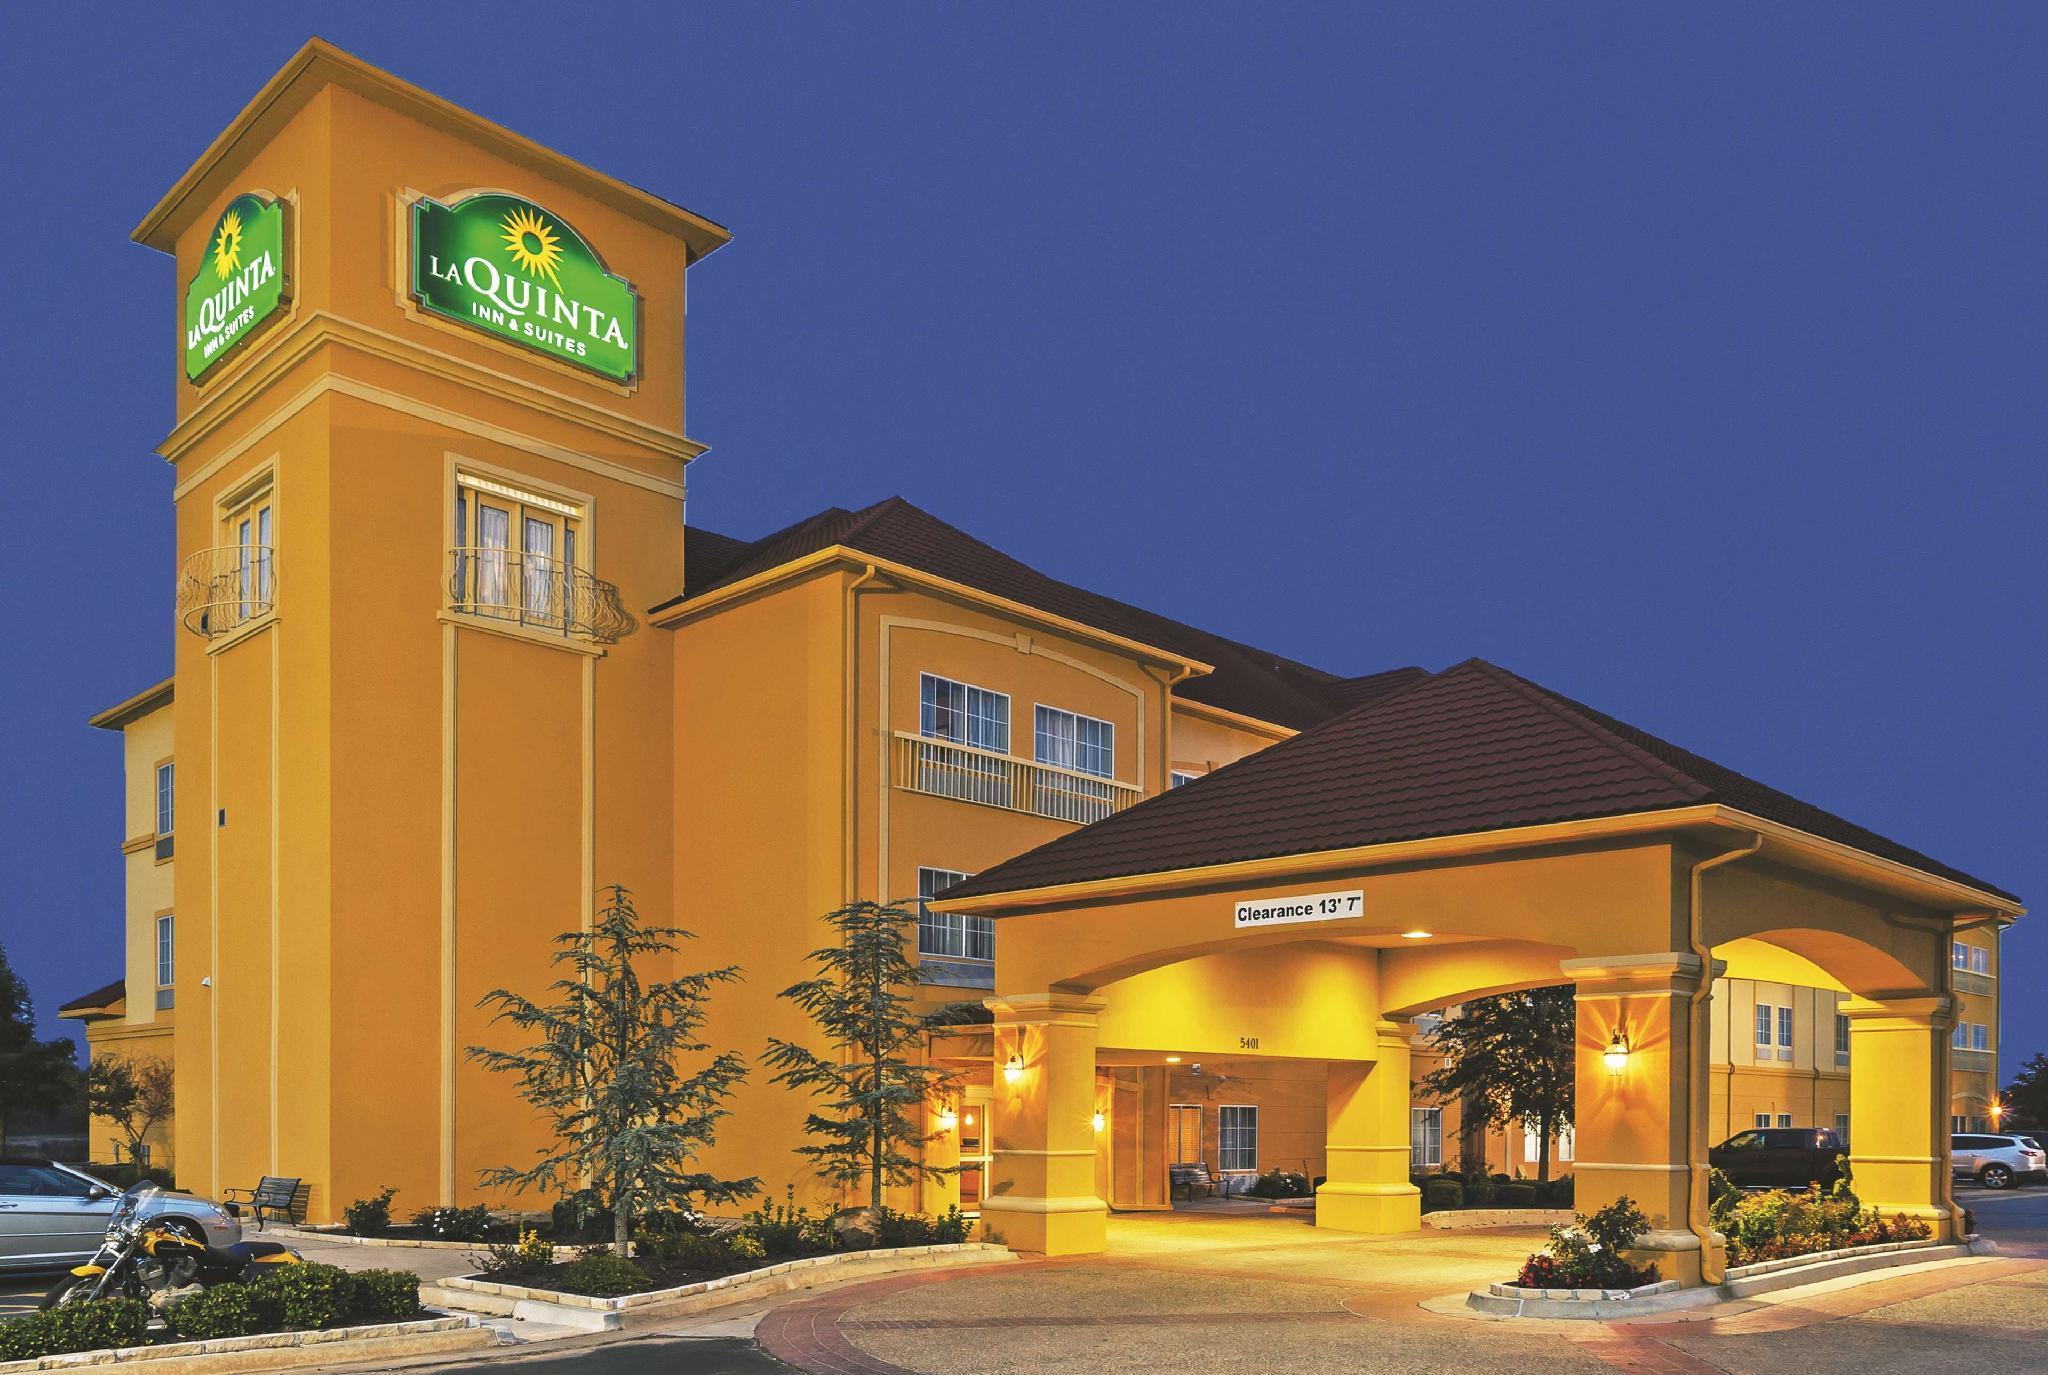 La Quinta Inn And Suites By Wyndham Shawnee